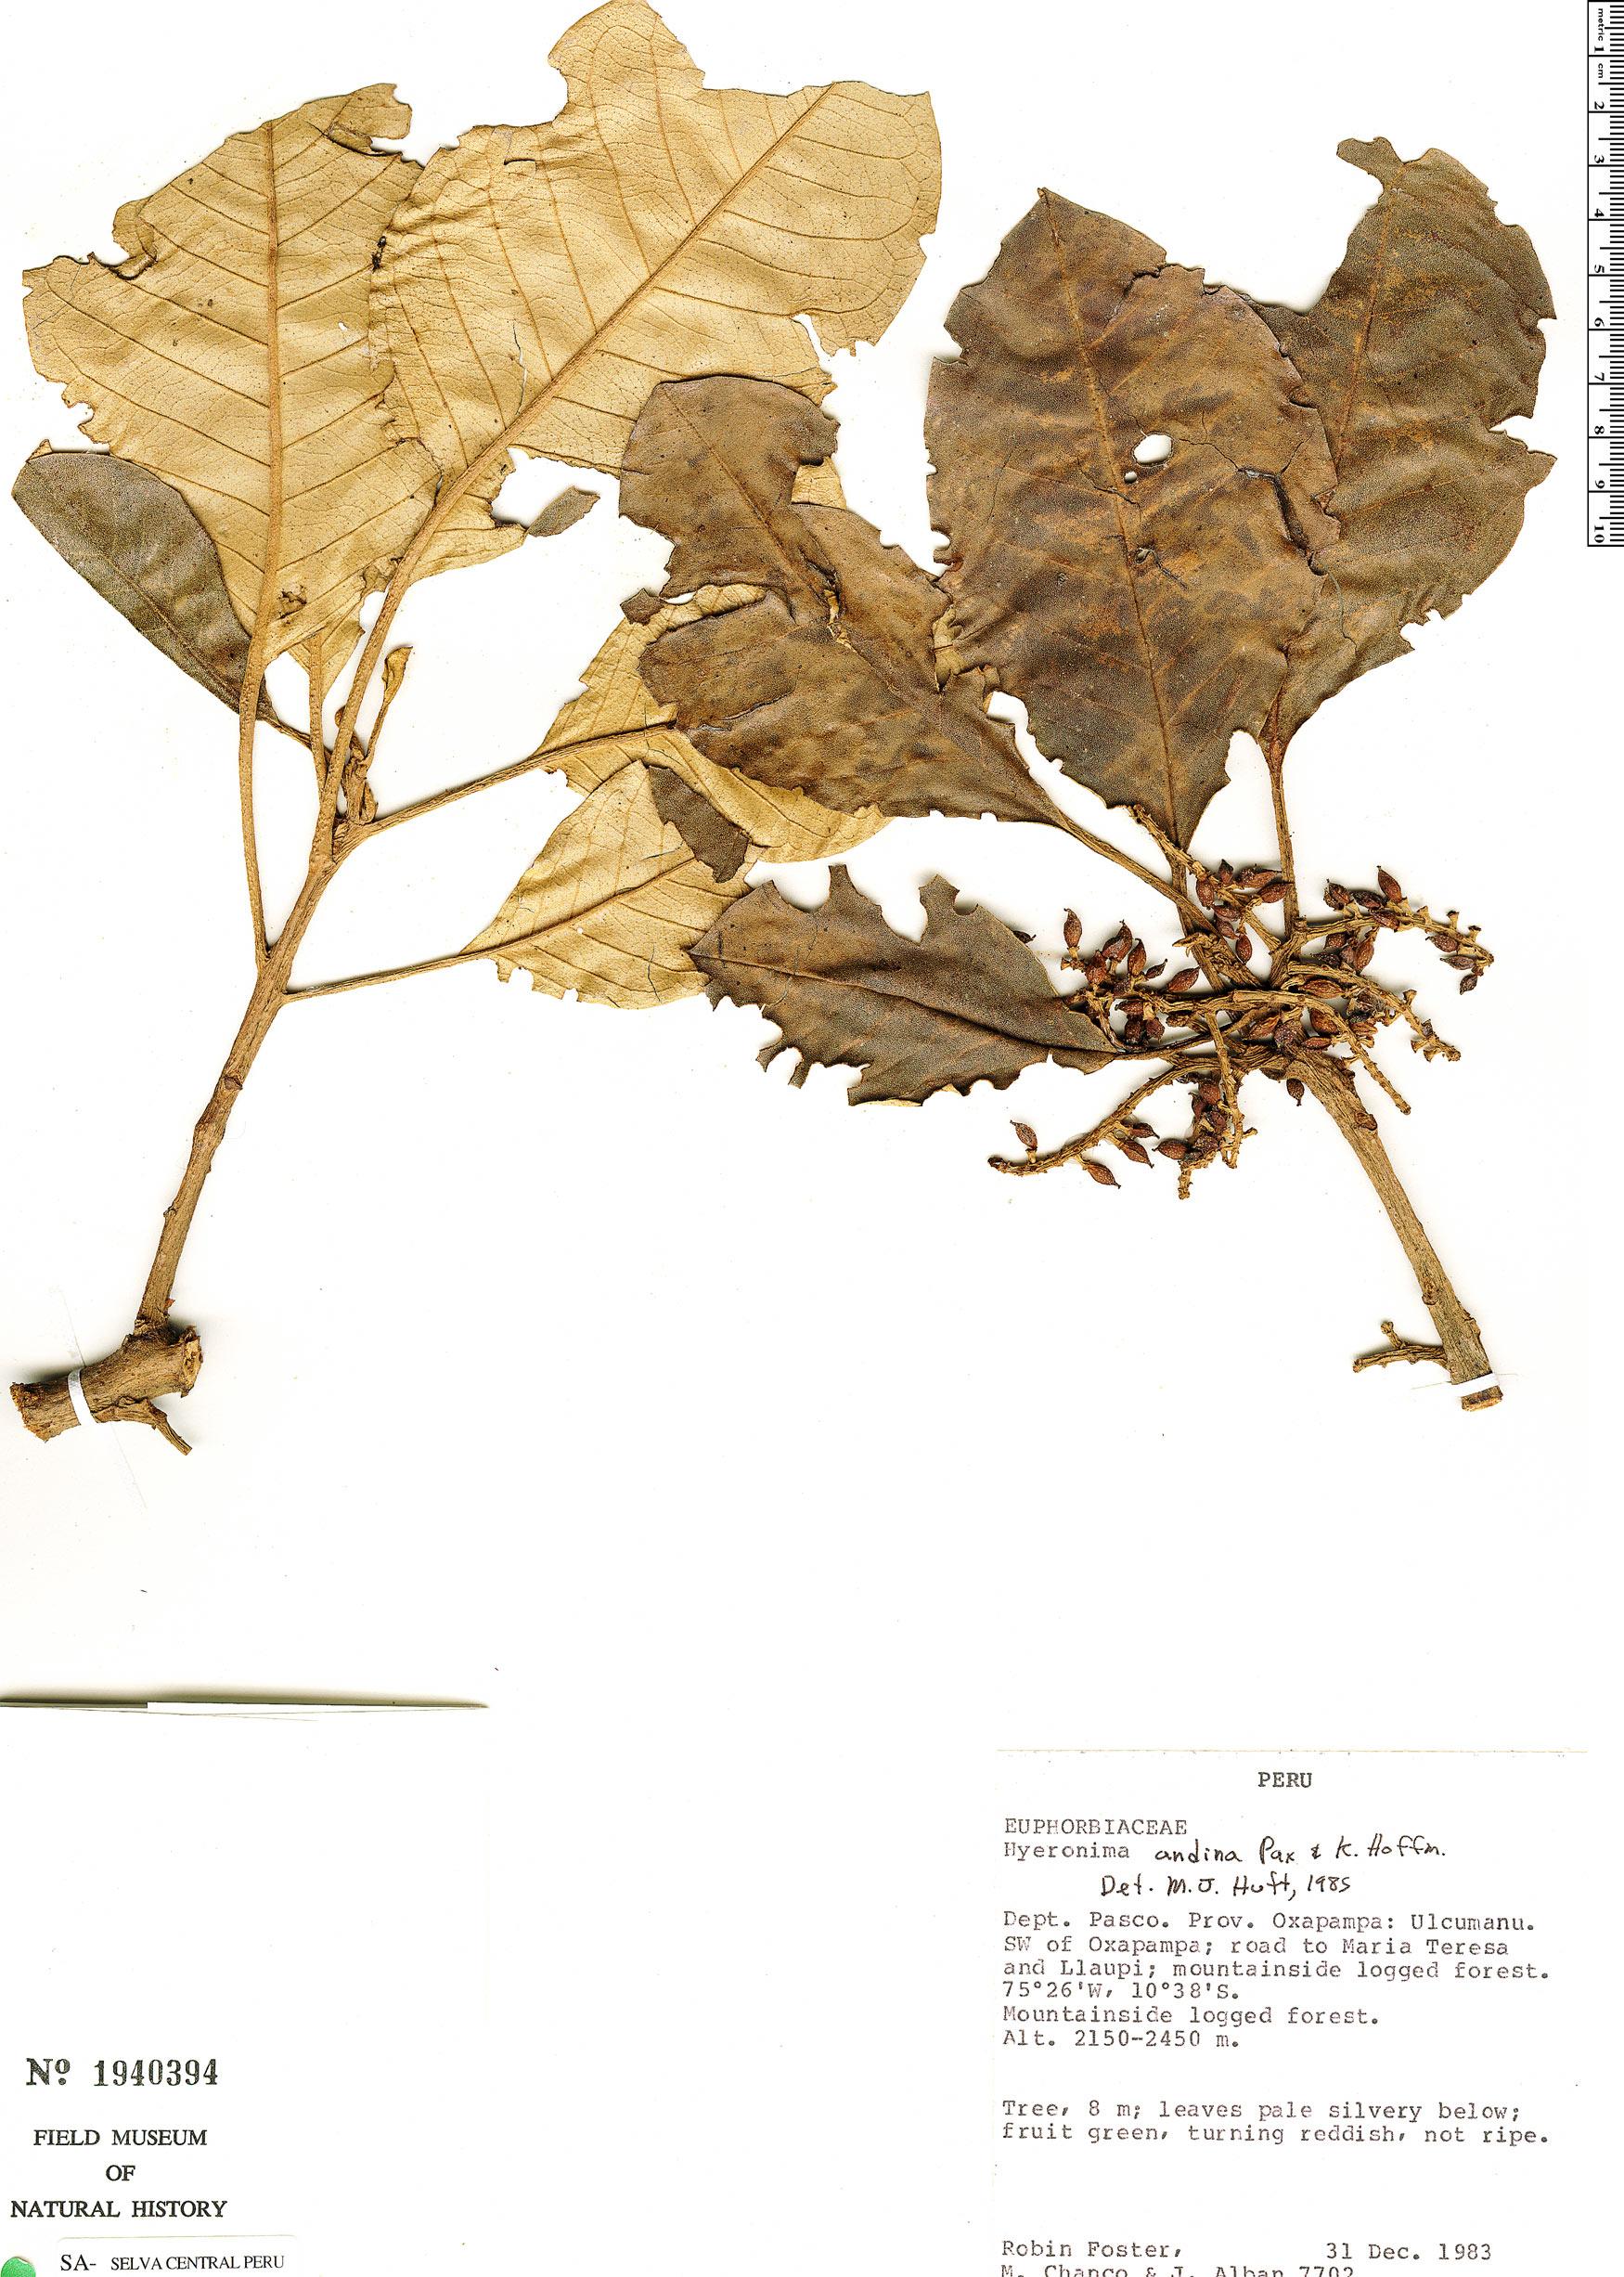 Specimen: Hieronyma andina